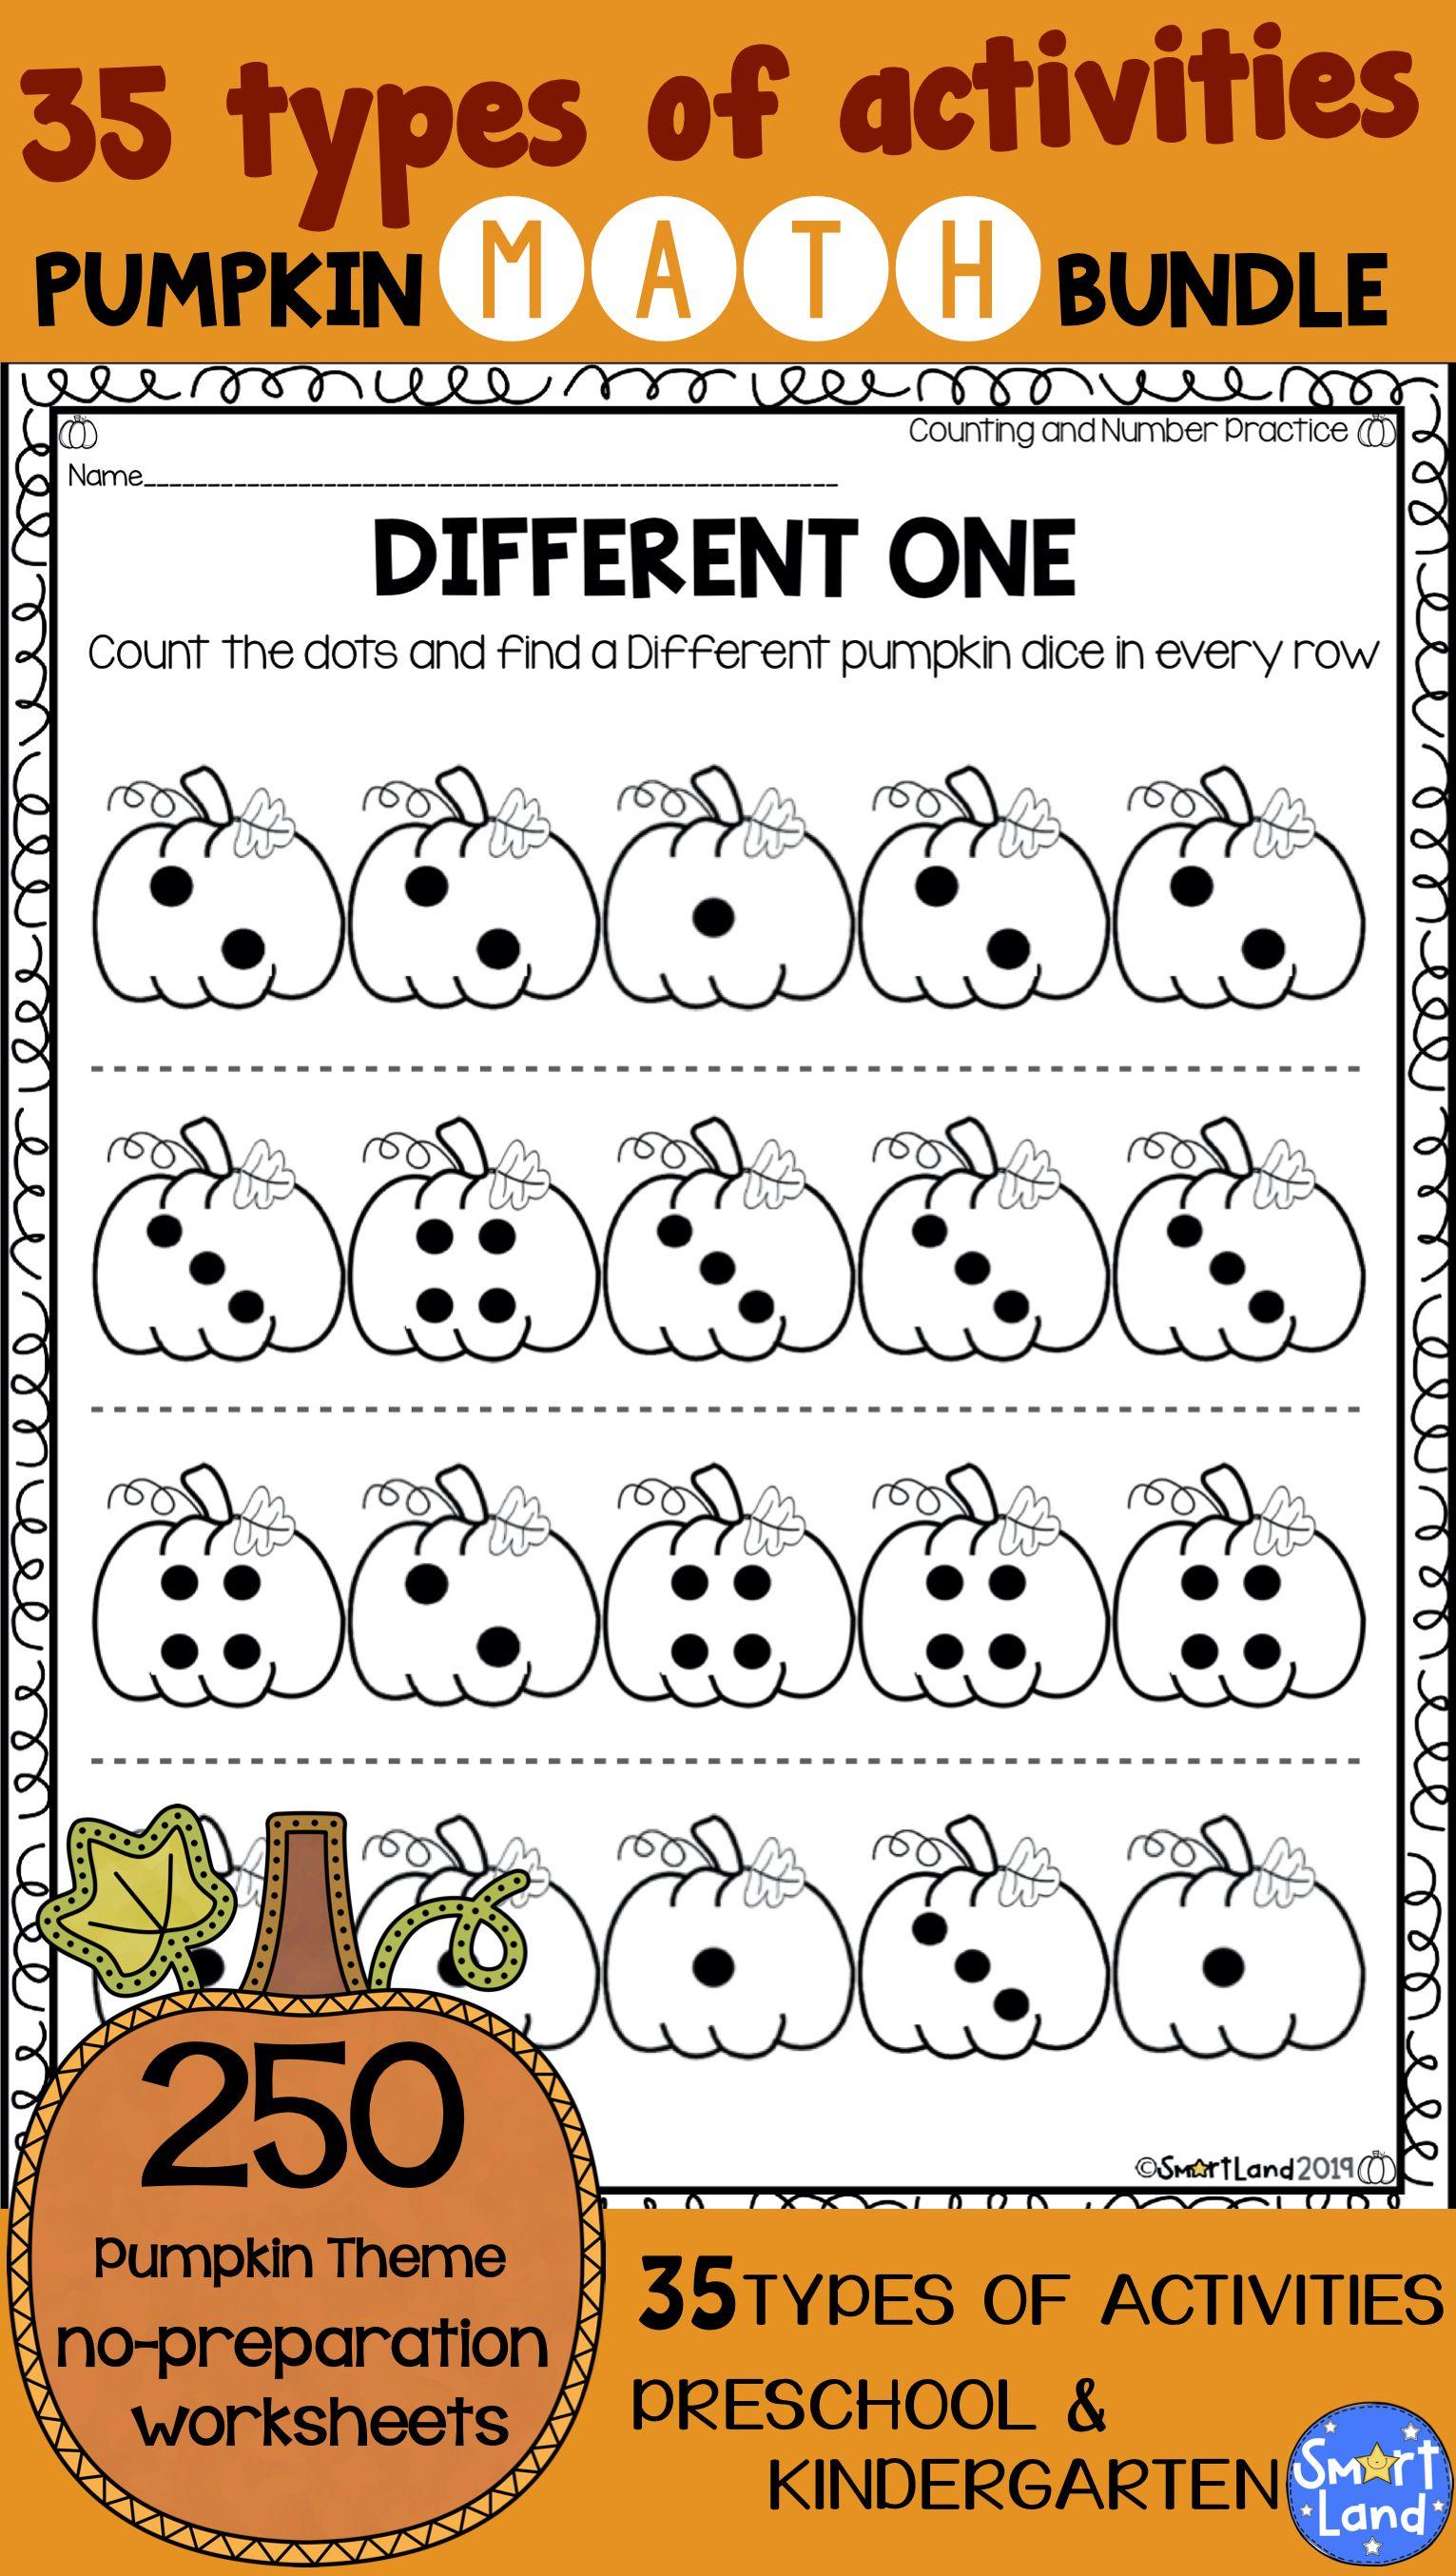 Math Worksheets Complete Number Practice Set Of Printables Numbers 1 10 Prek K 250 Page Math Practice Worksheets Preschool Math Worksheets Math Practices